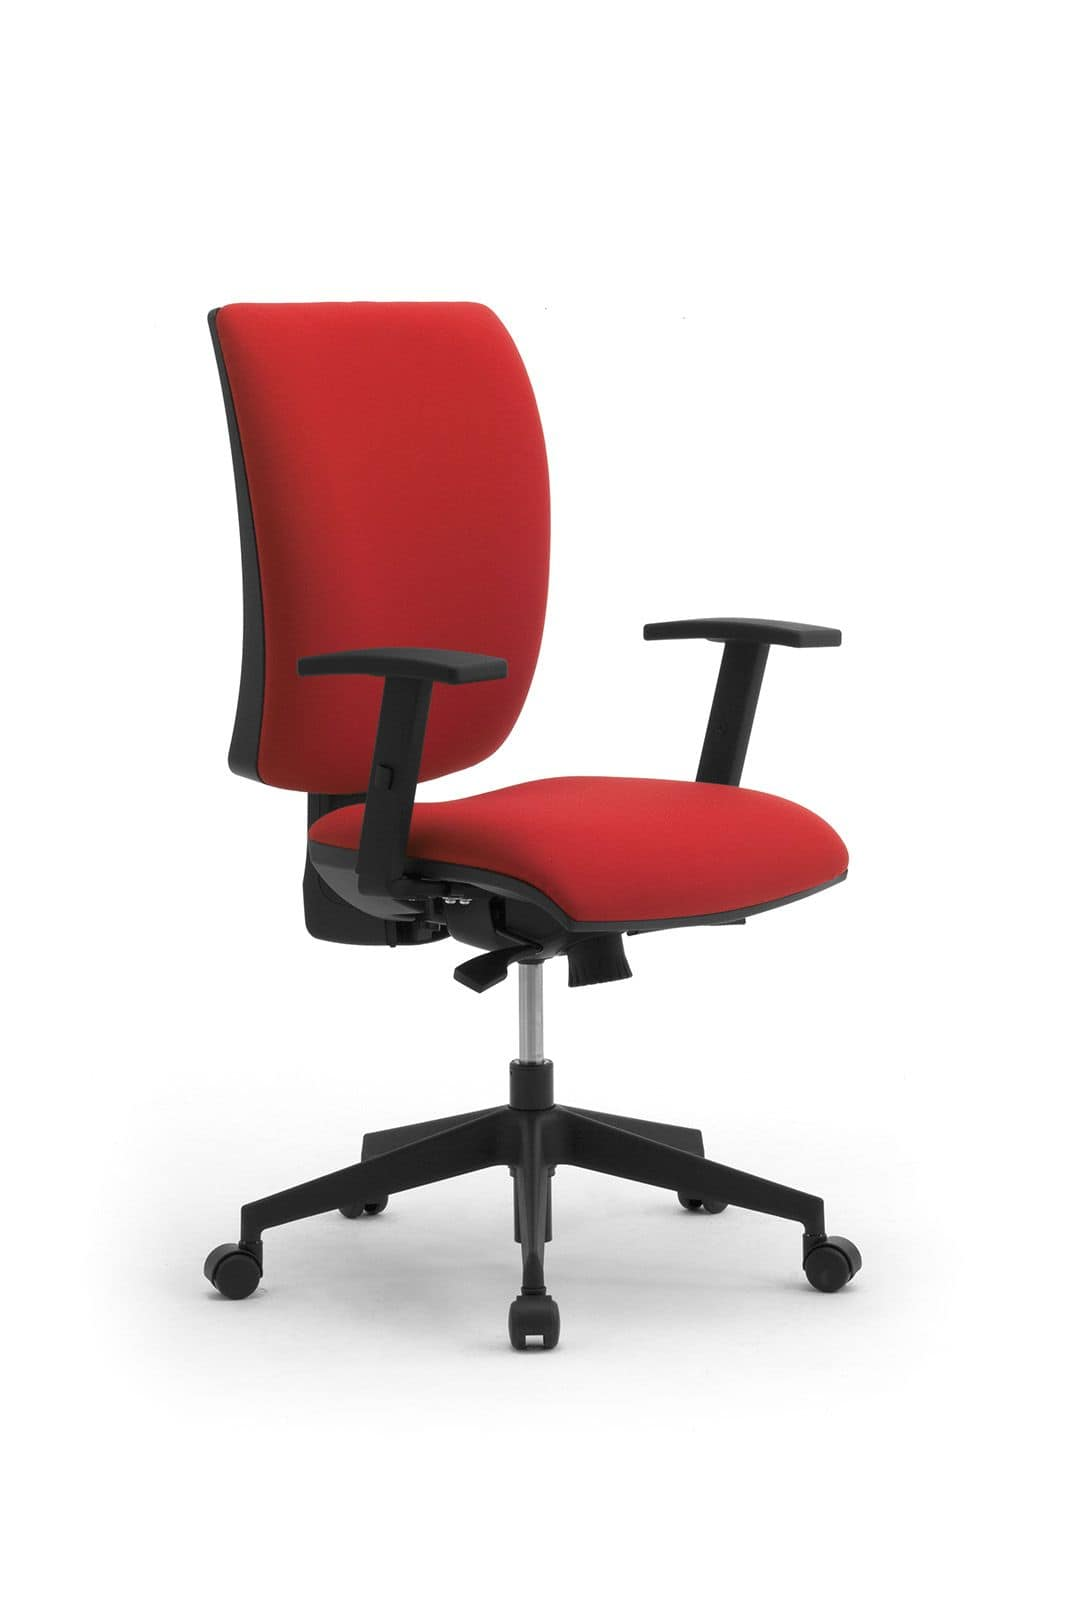 Sprint X, Operational office chair, with medium-tall backrest